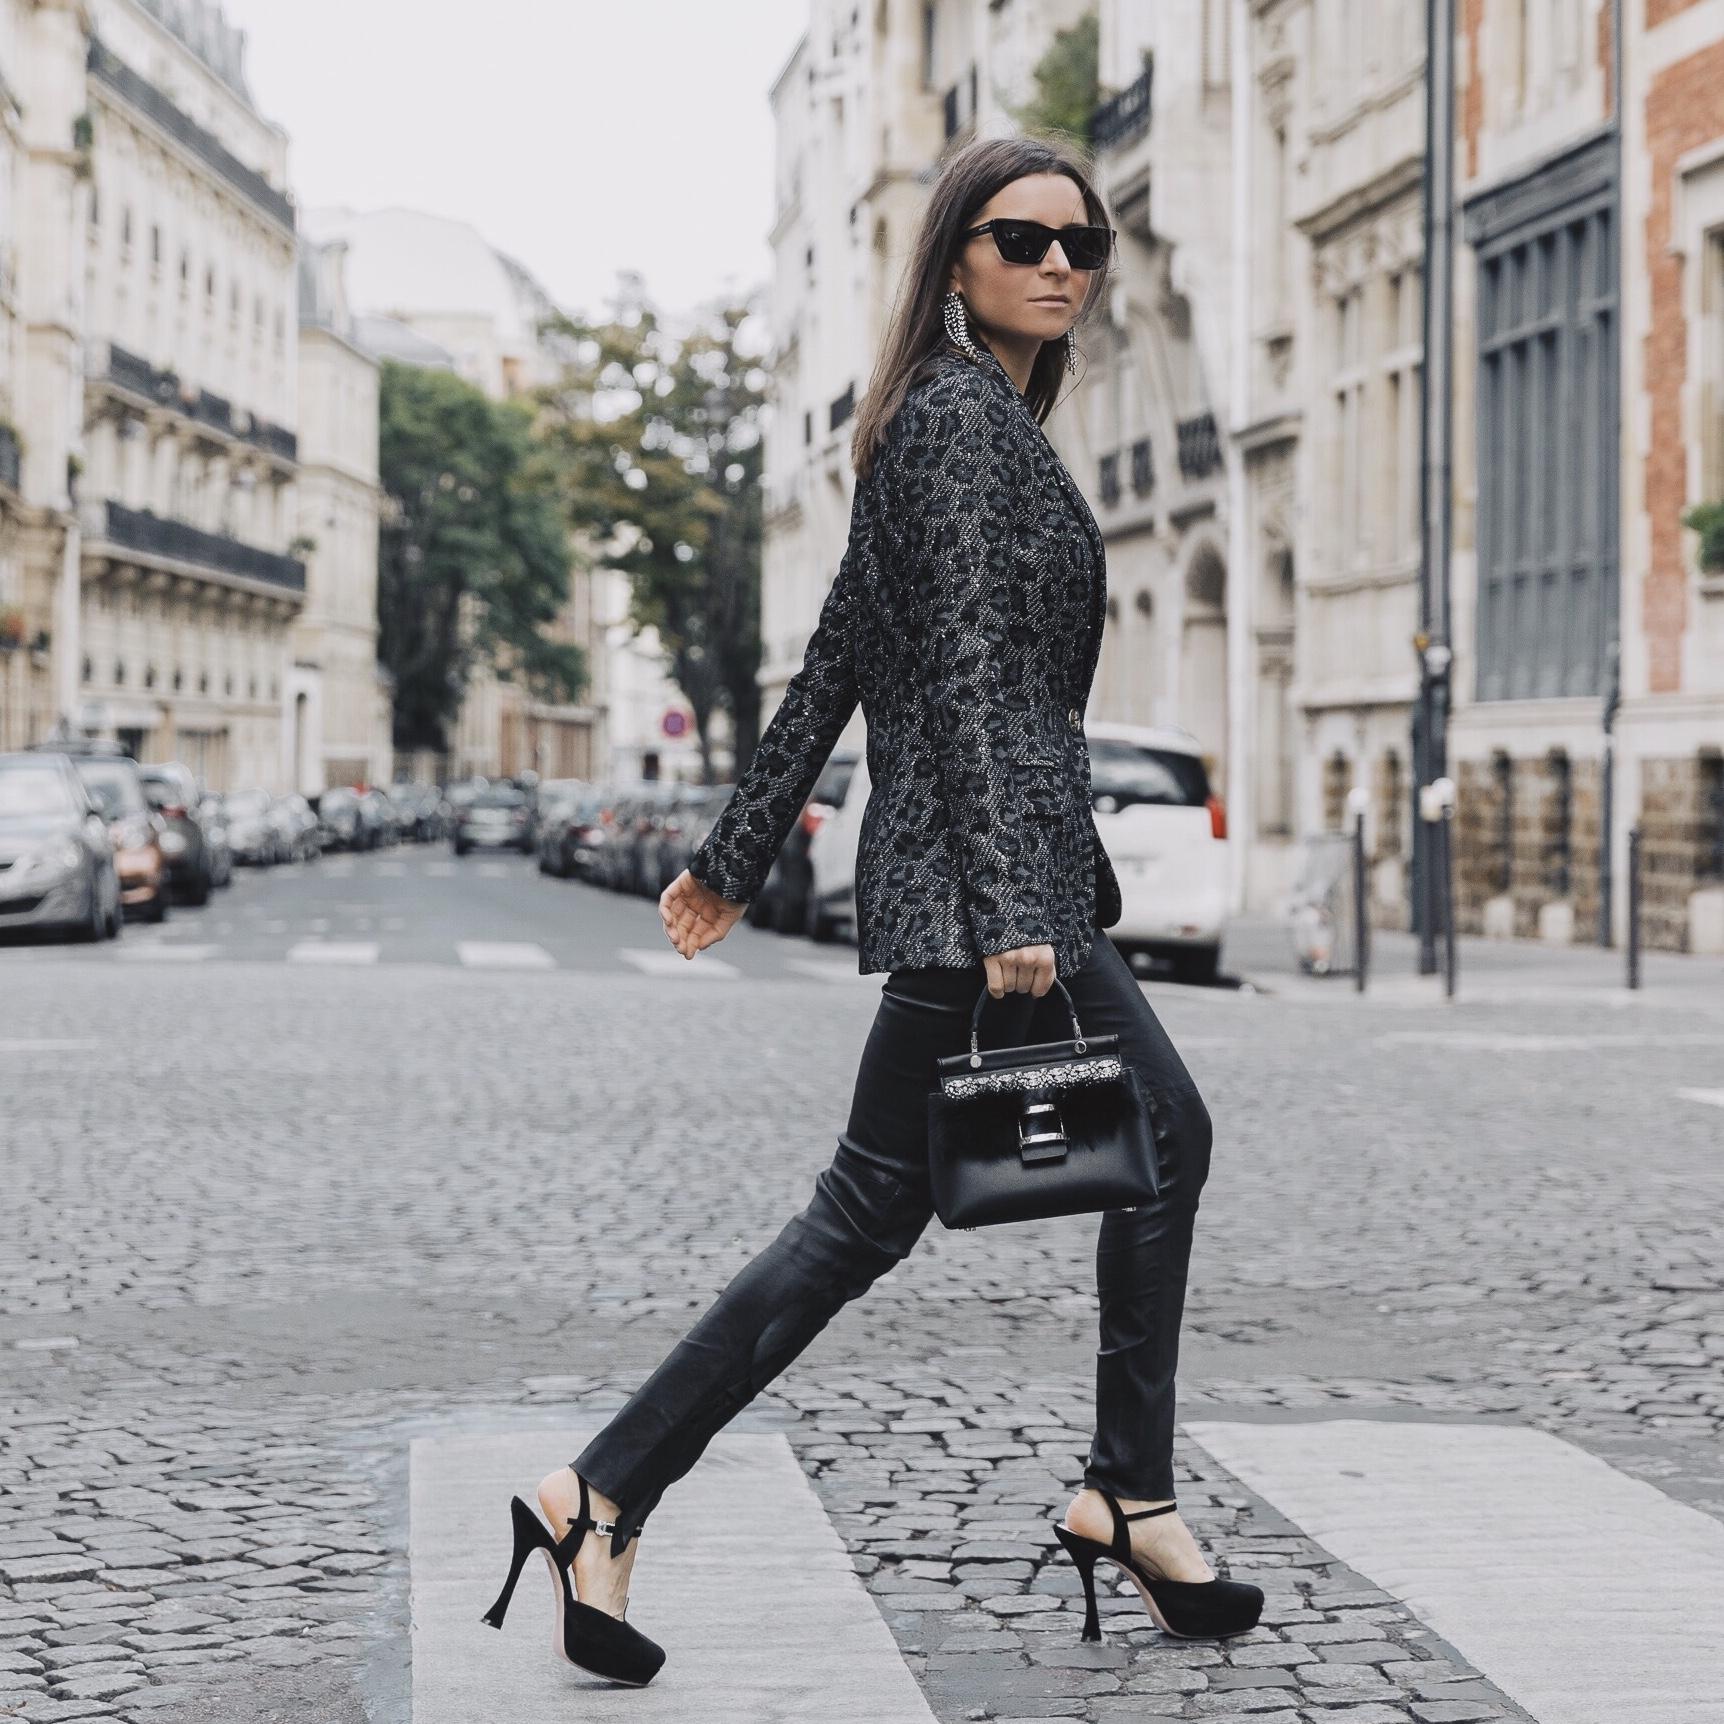 PFW SS20 Street Style Fall 2019 Paris Fashion Week Julia Comil wearing Iro pants, jacket Saint John, pumps Roger Vivier, Bag Roger Vivier